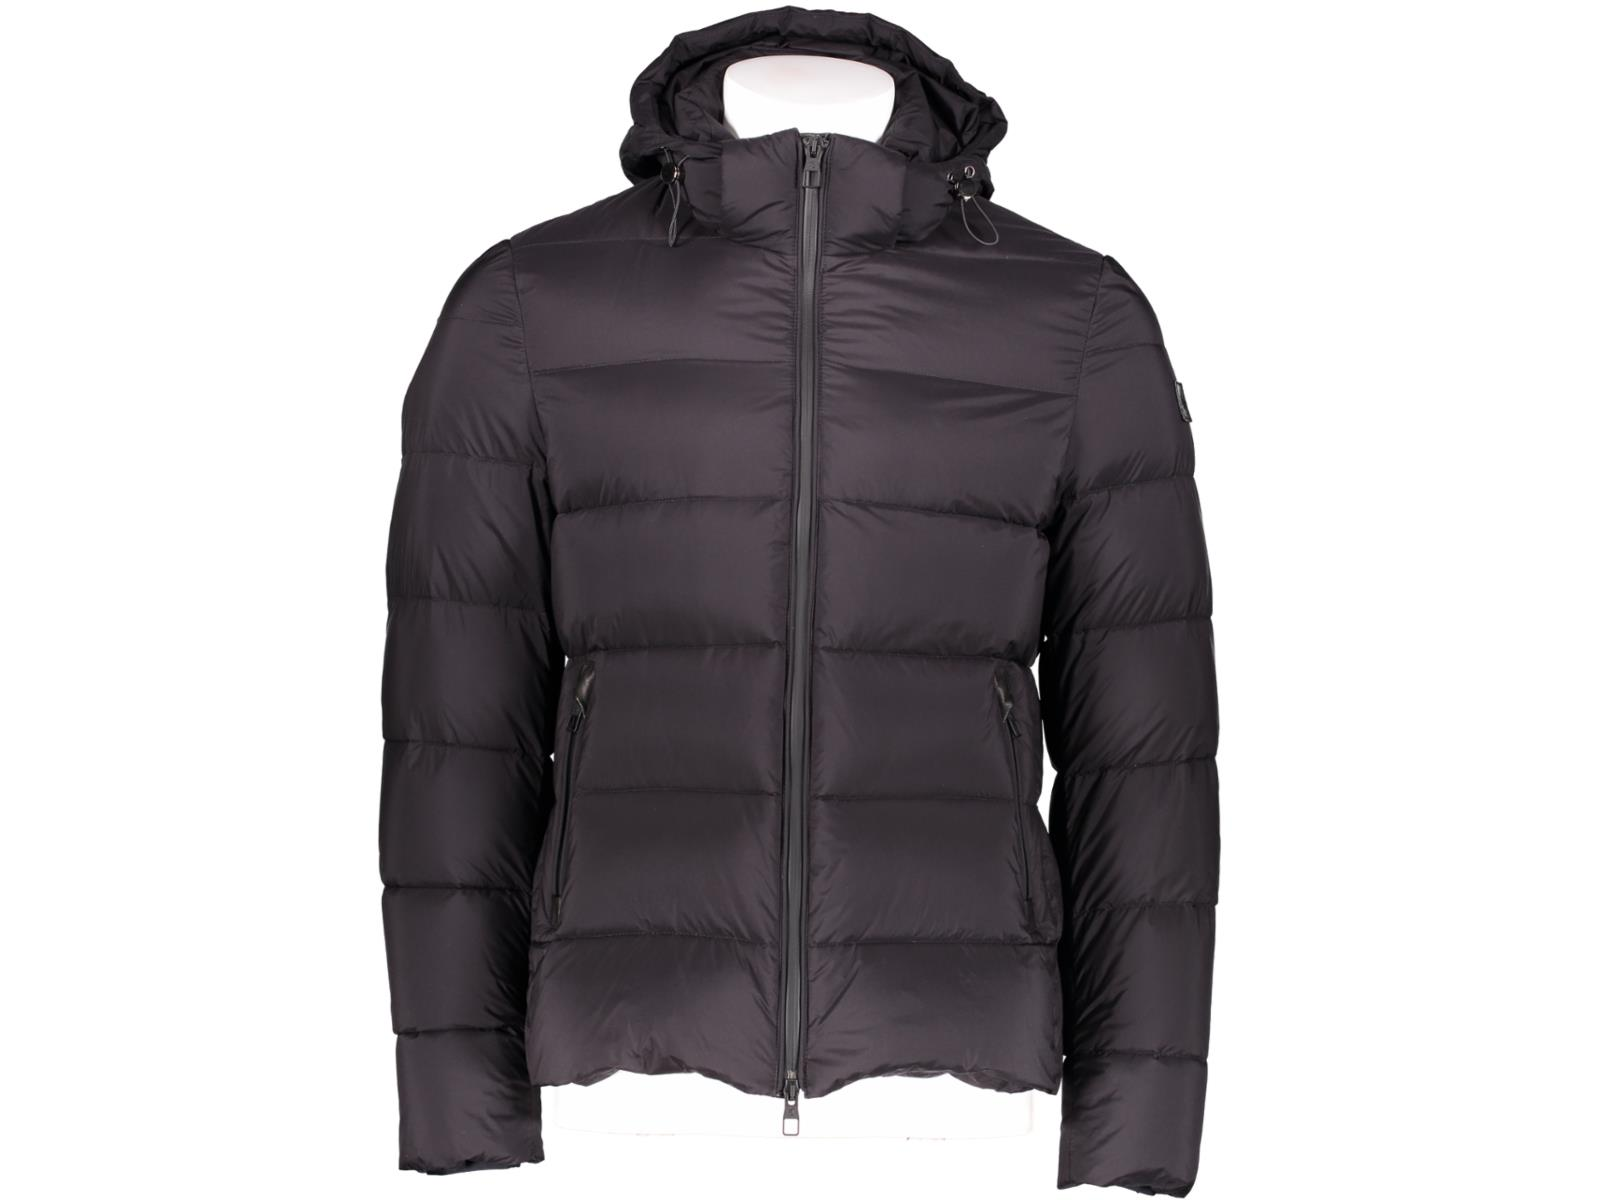 new style ac5ff 235b8 Montecore Piumino 2320dx245c 172521 | Lombardi Moda